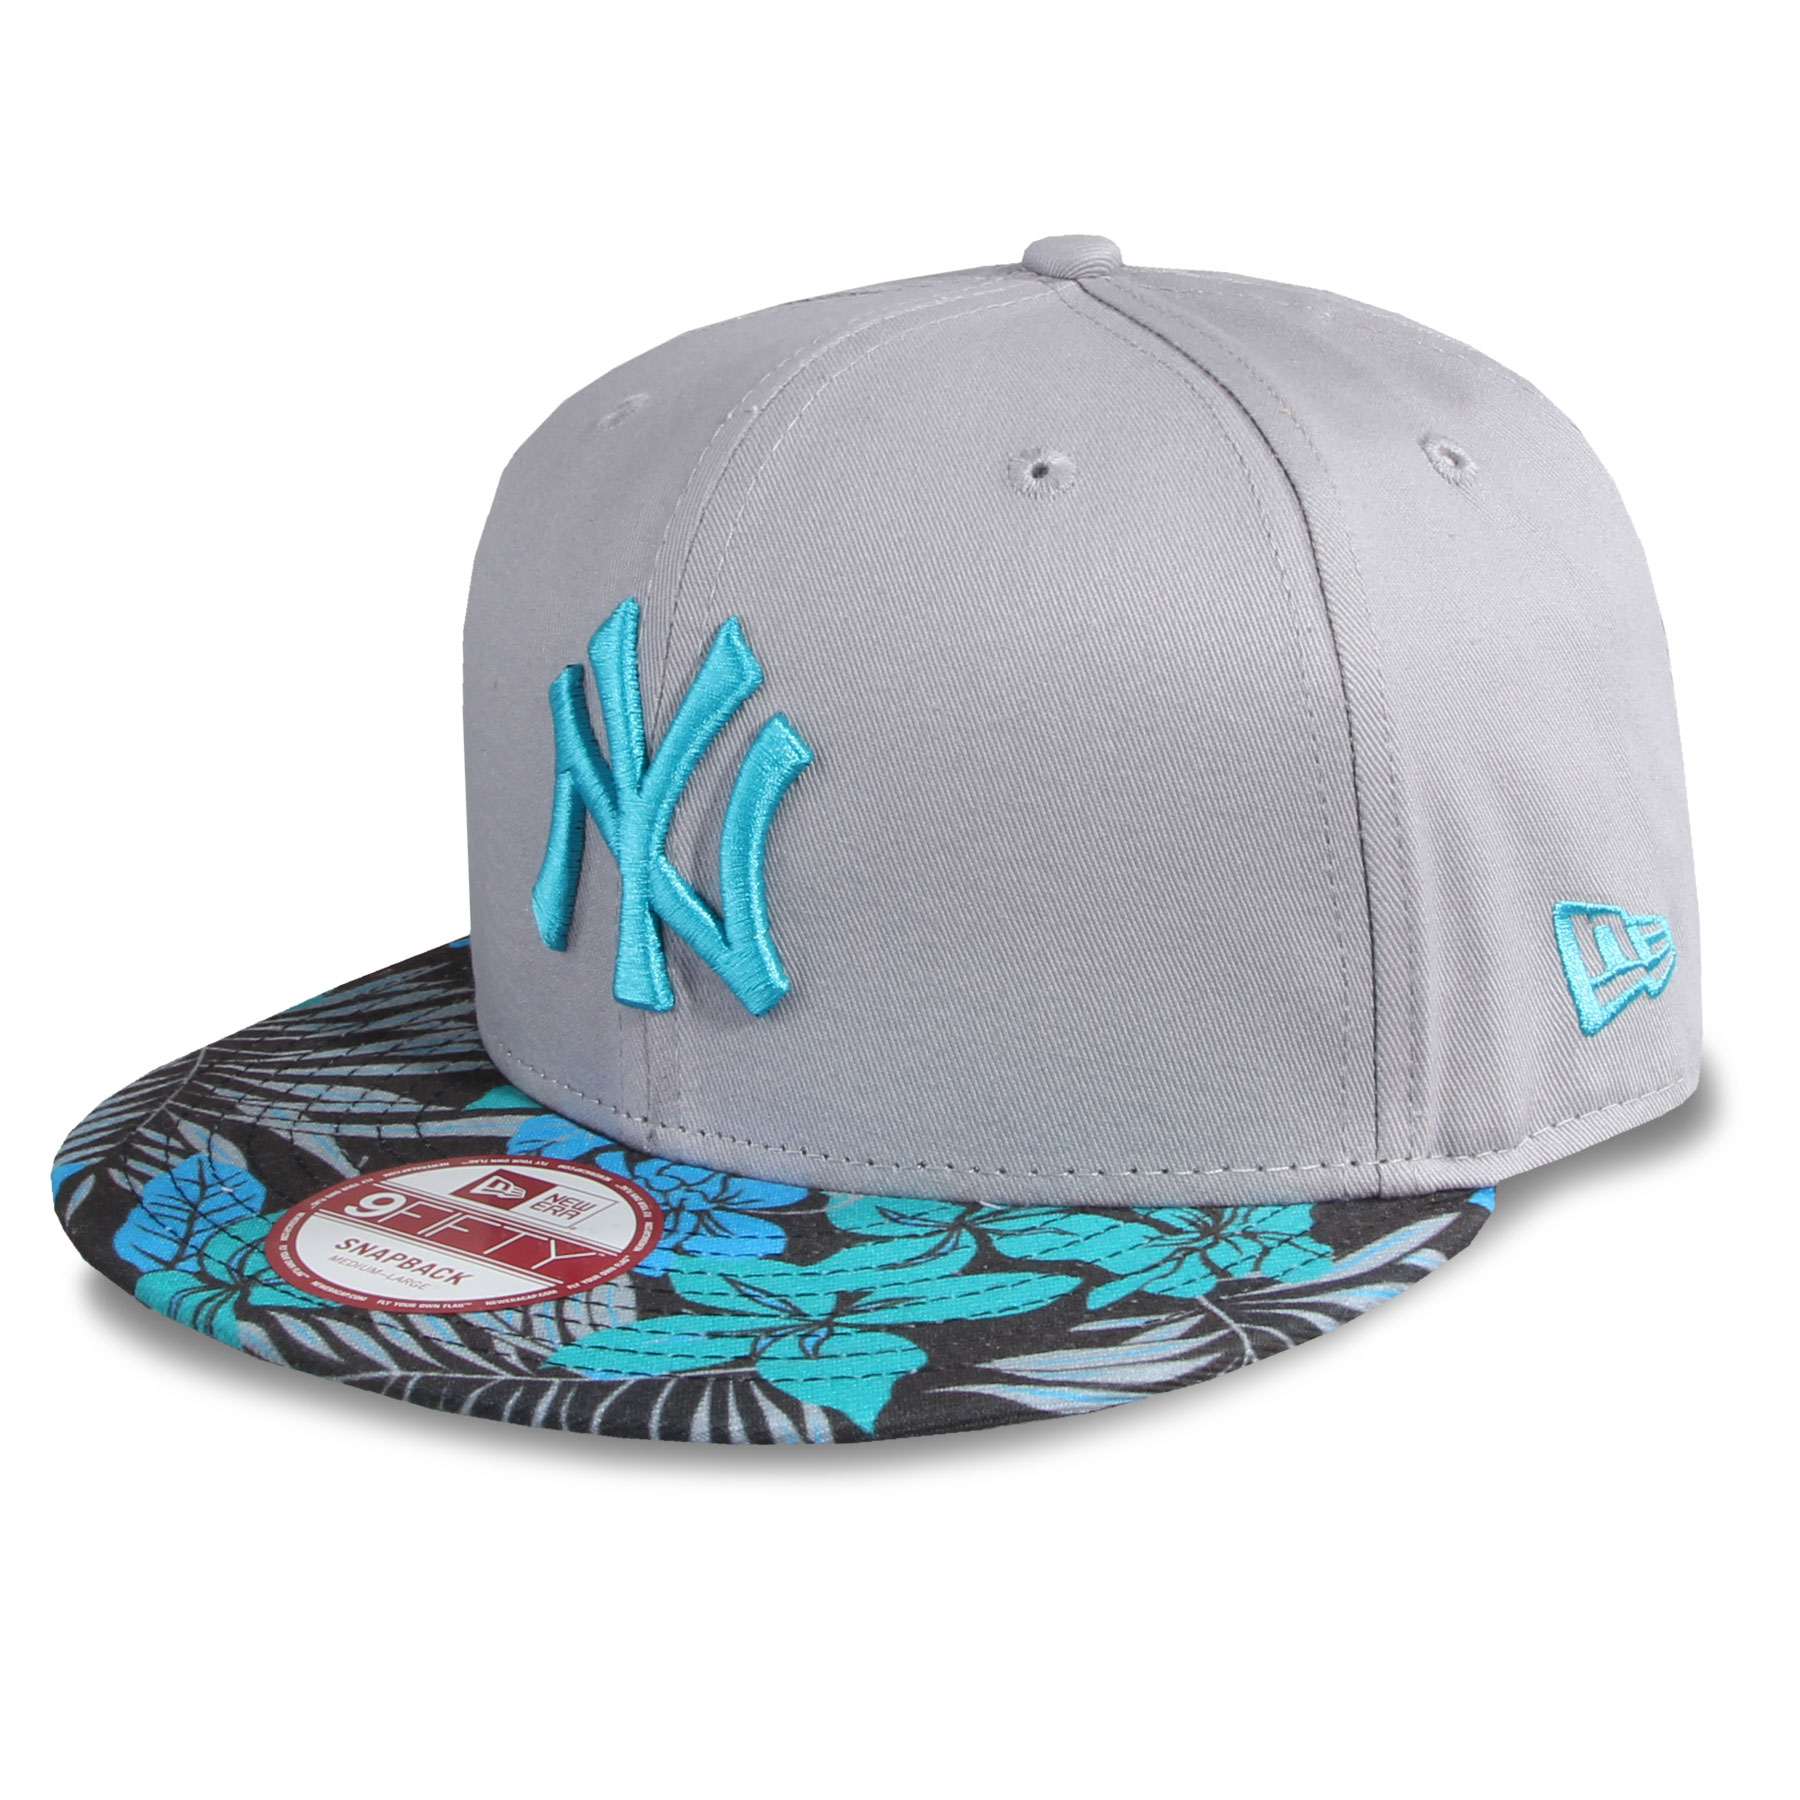 New Era Cap Snapback 9fifty New York Yankees Dodgers Sox Brooklyn ... c5455b848454